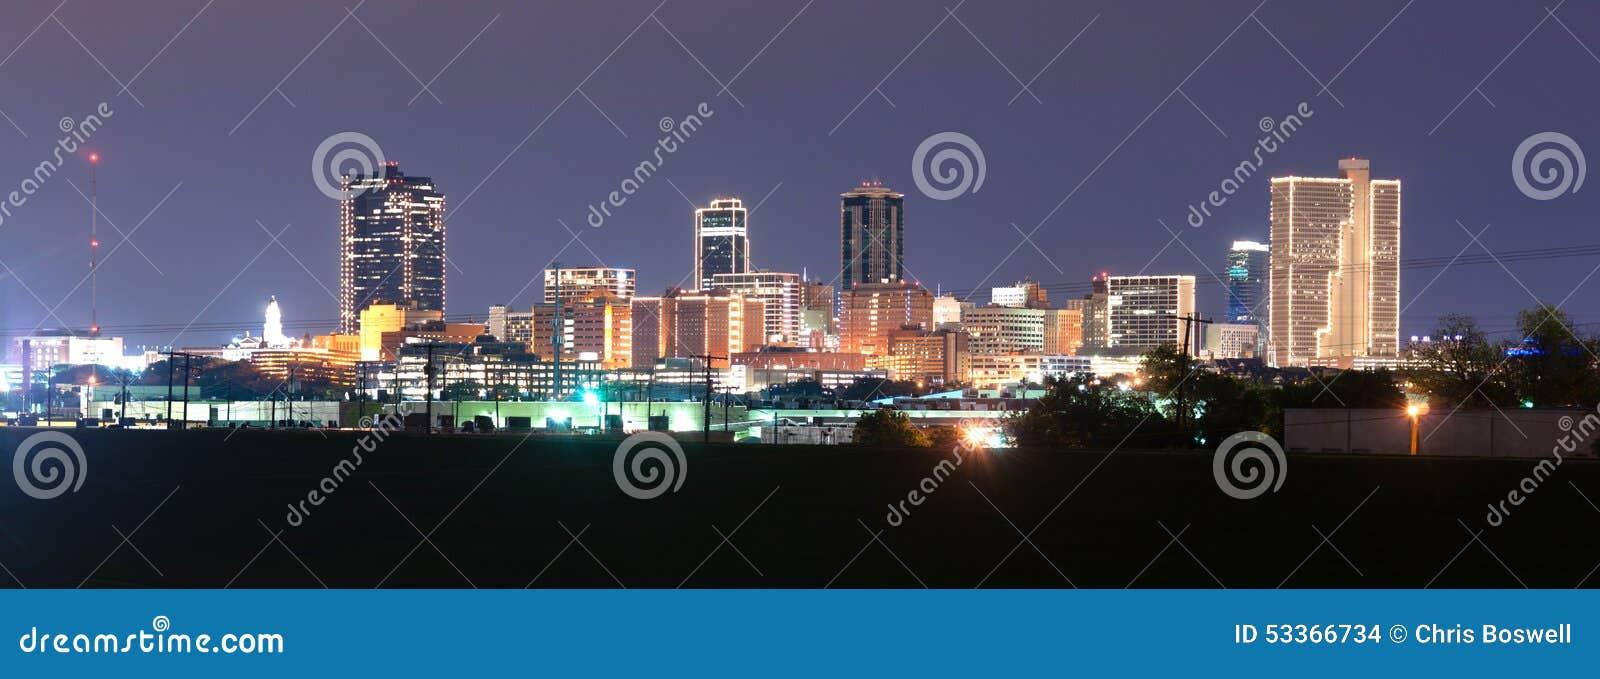 Fort Worth Texas Downtown Skyline Trinity River de última hora